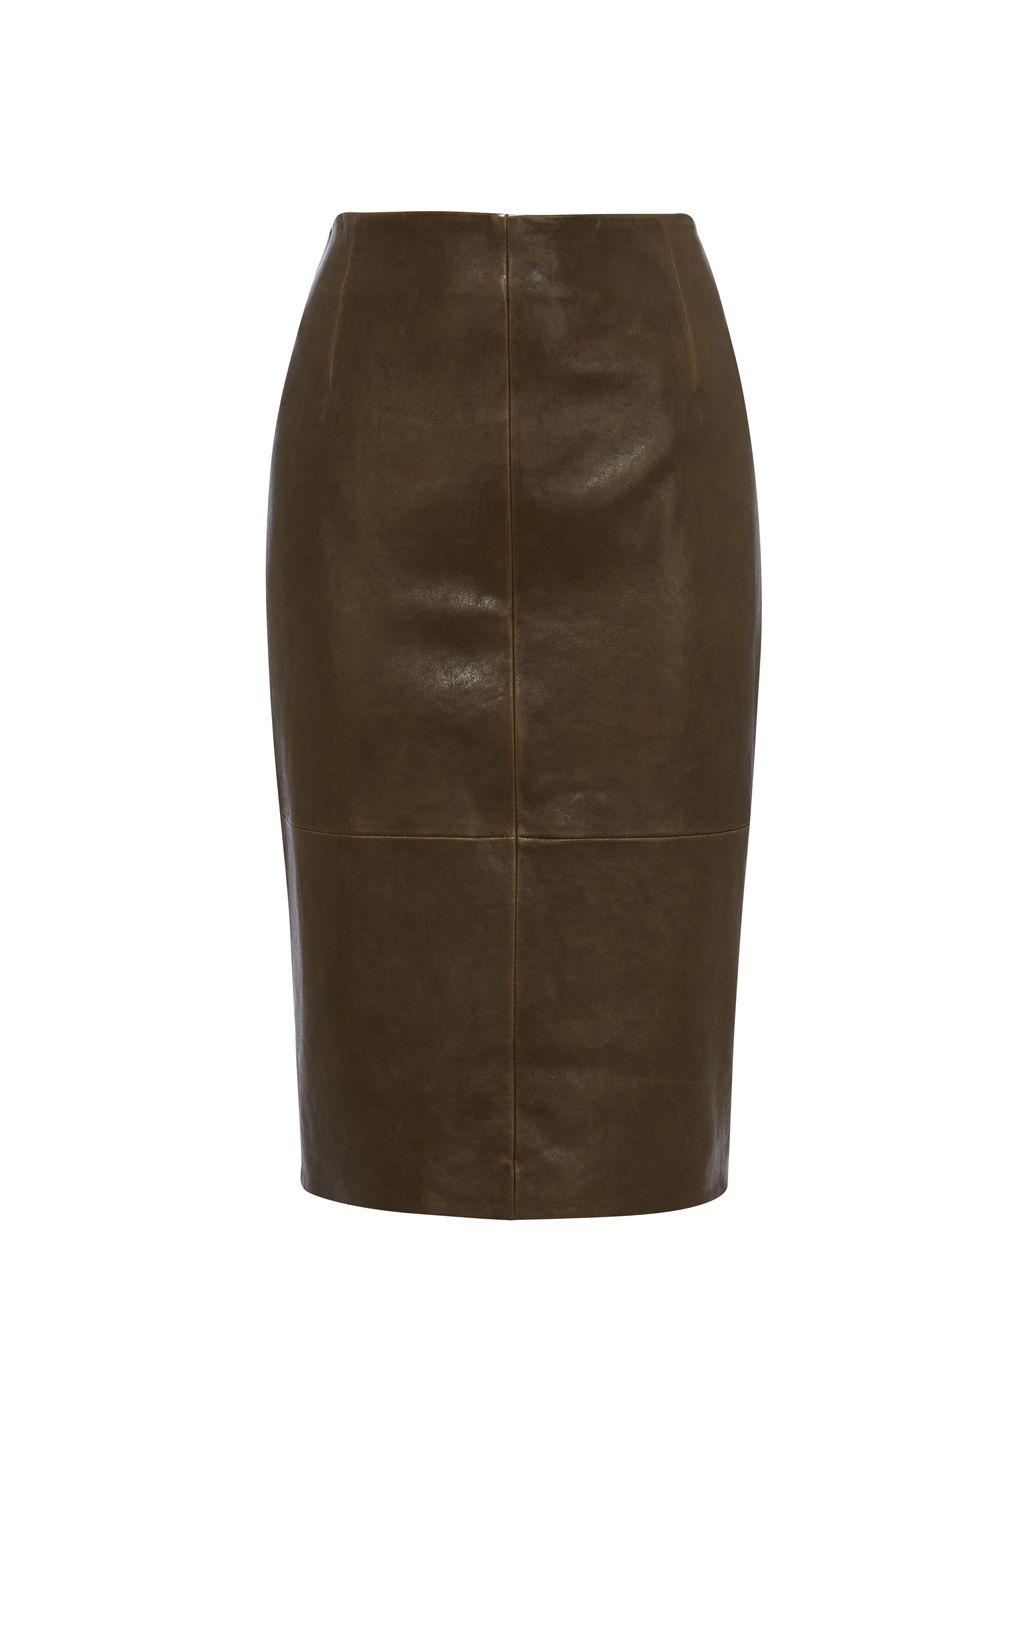 Karen Millen, LEATHER PENCIL SKIRT Khaki | Fall wardrobe ...